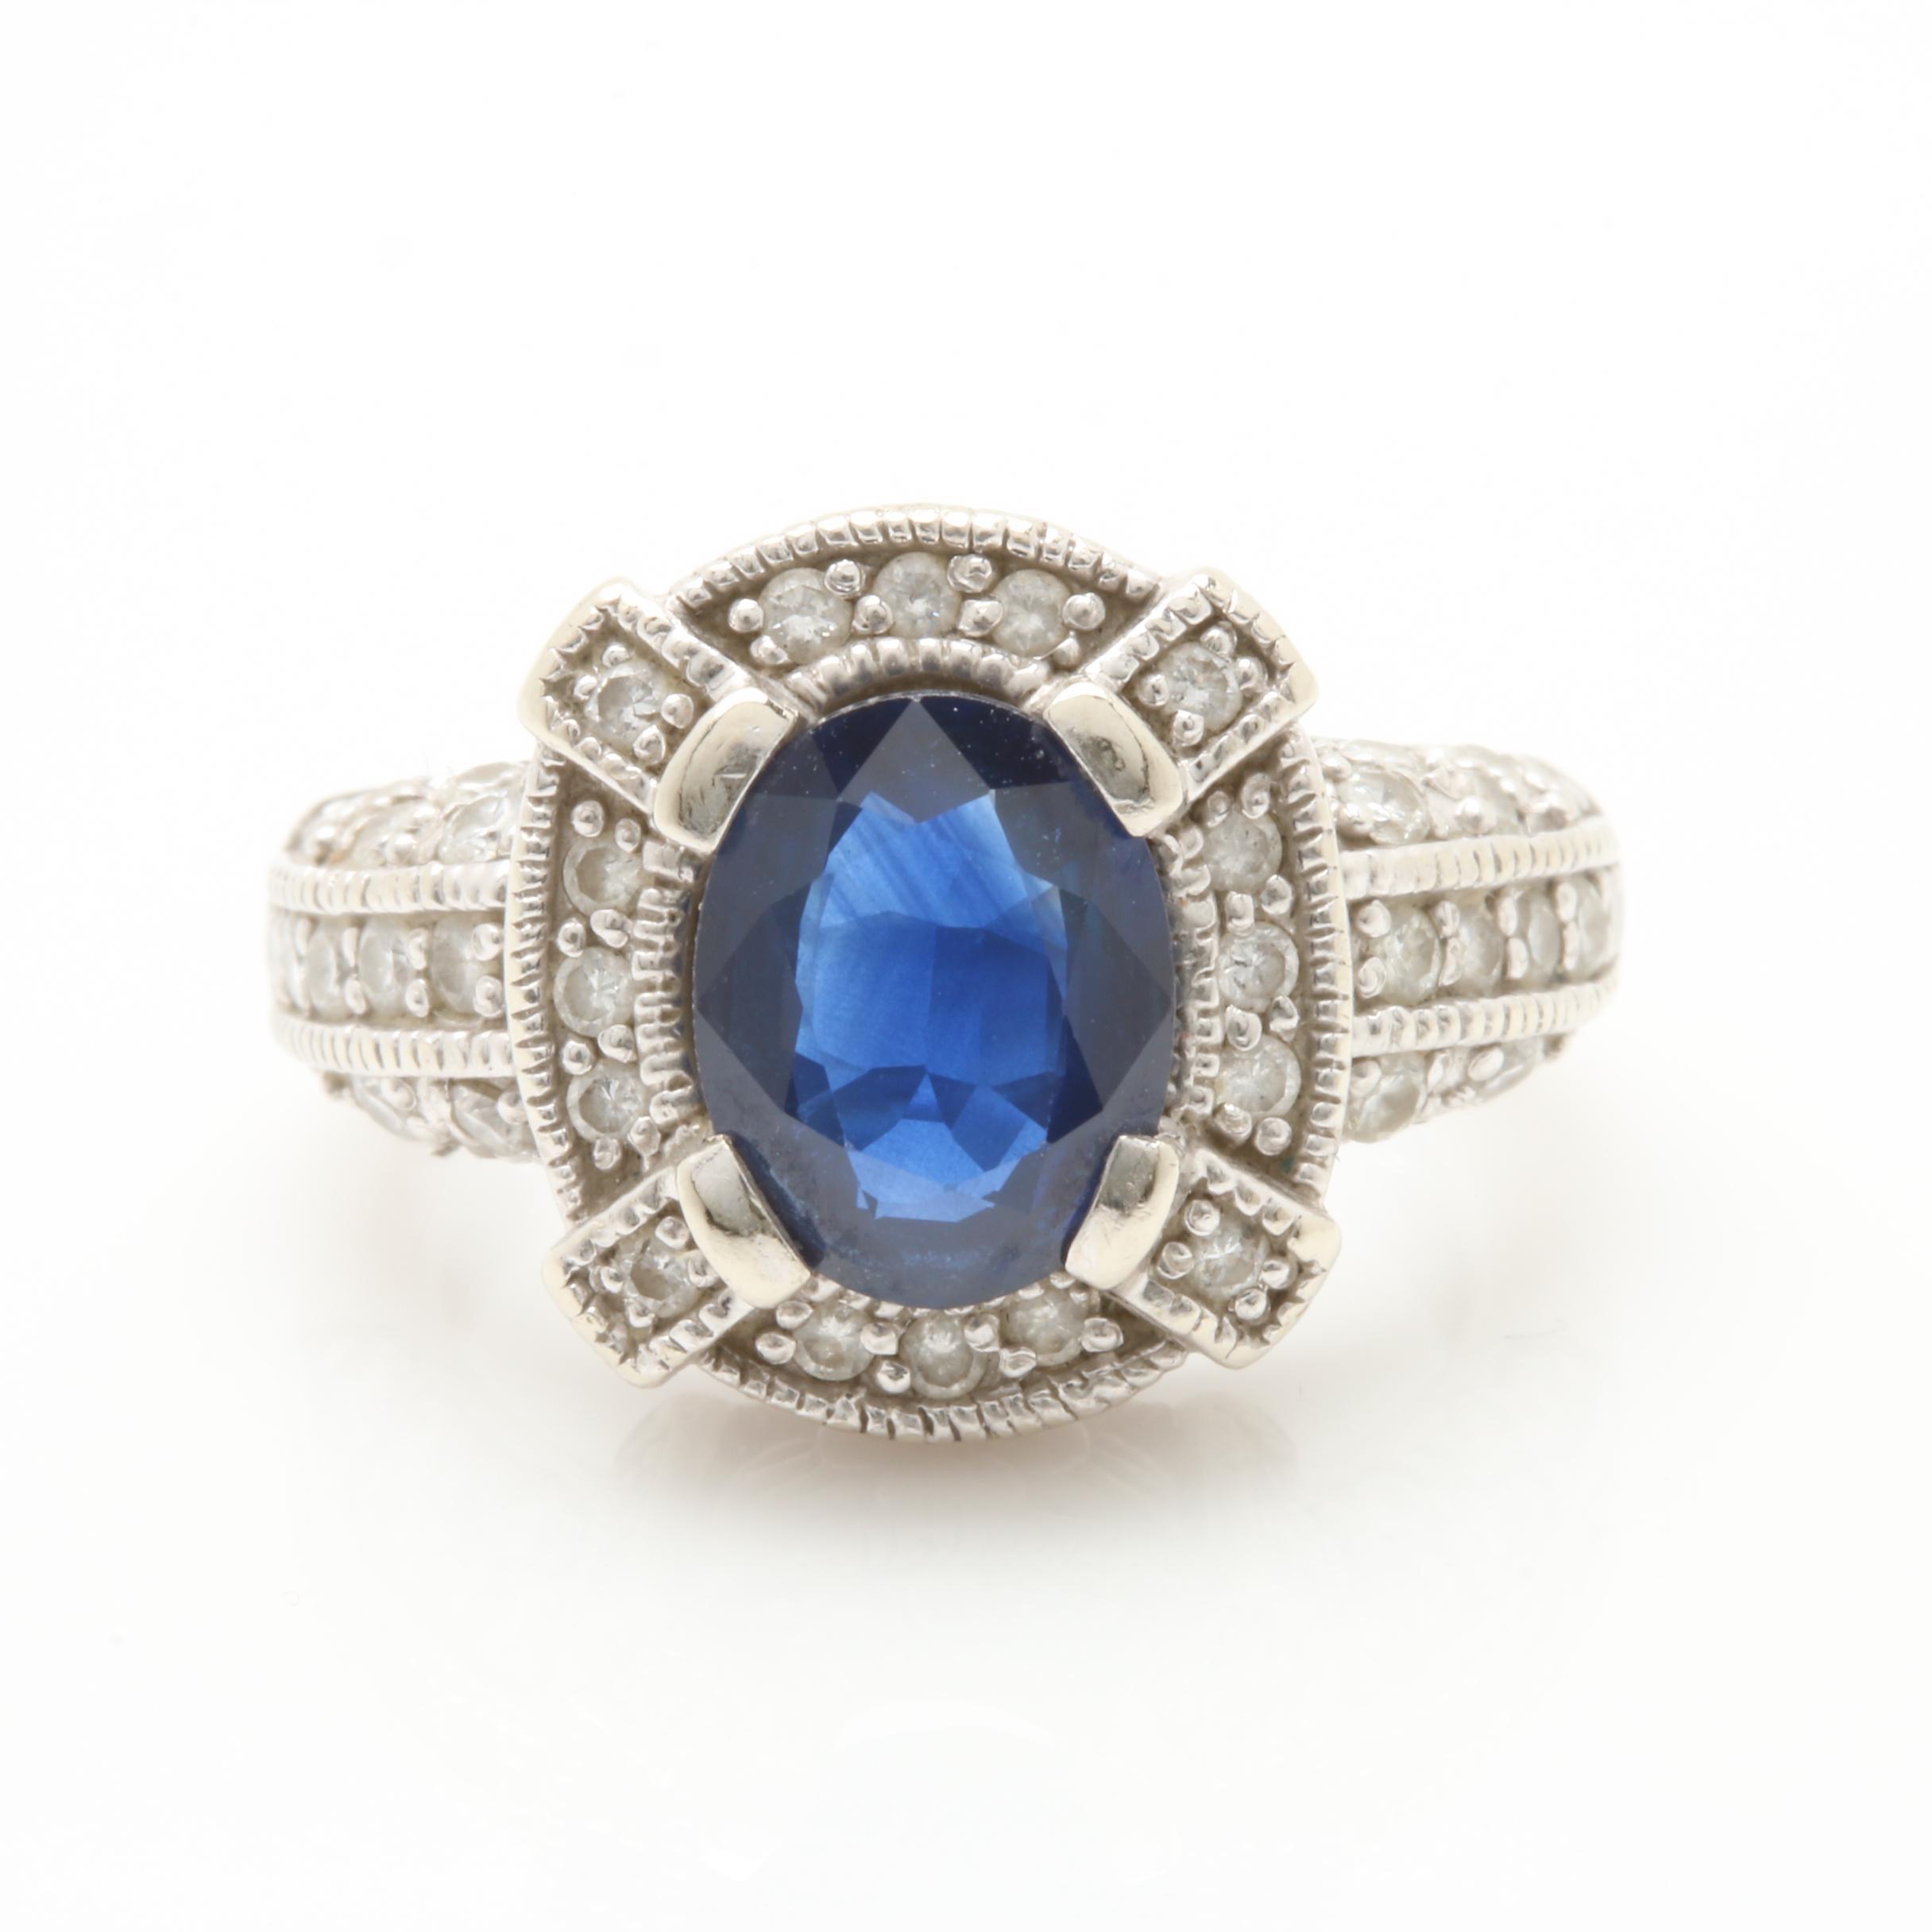 14K White Gold 1.48 CT Sapphire and Diamond Ring